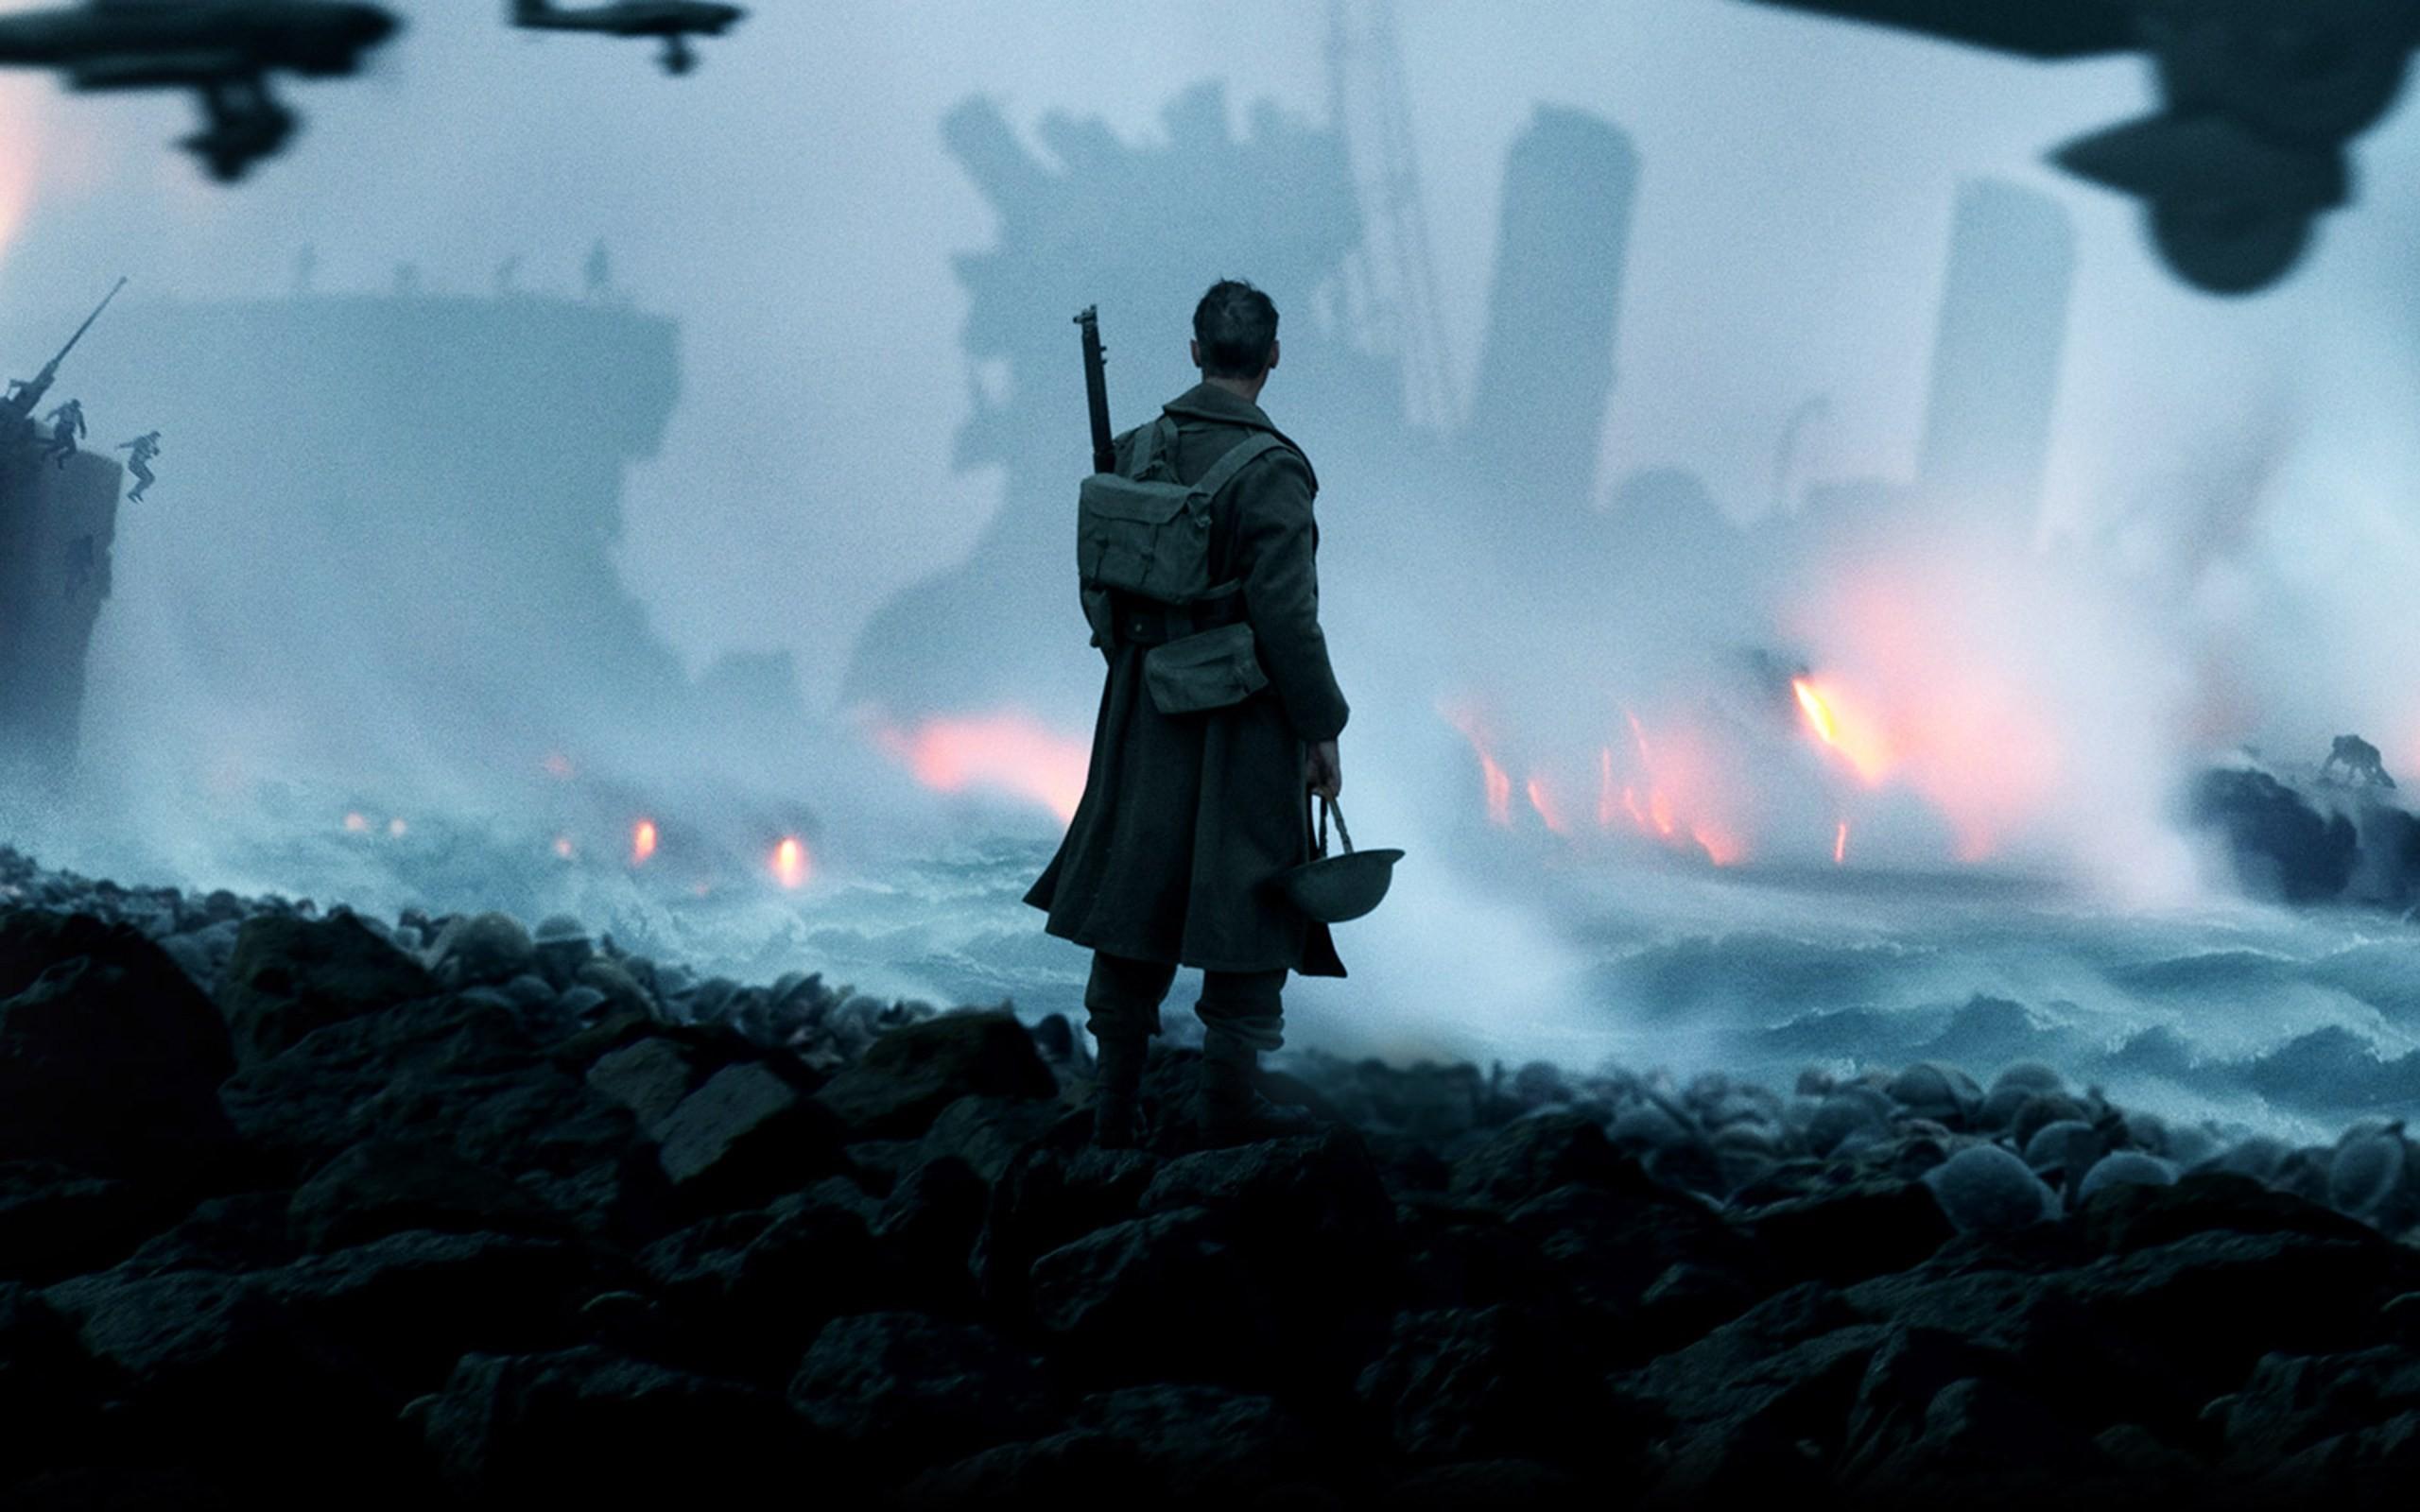 Wallpaper Dunkirk Tom Hardy Cillian Murphy Best Movies 12871